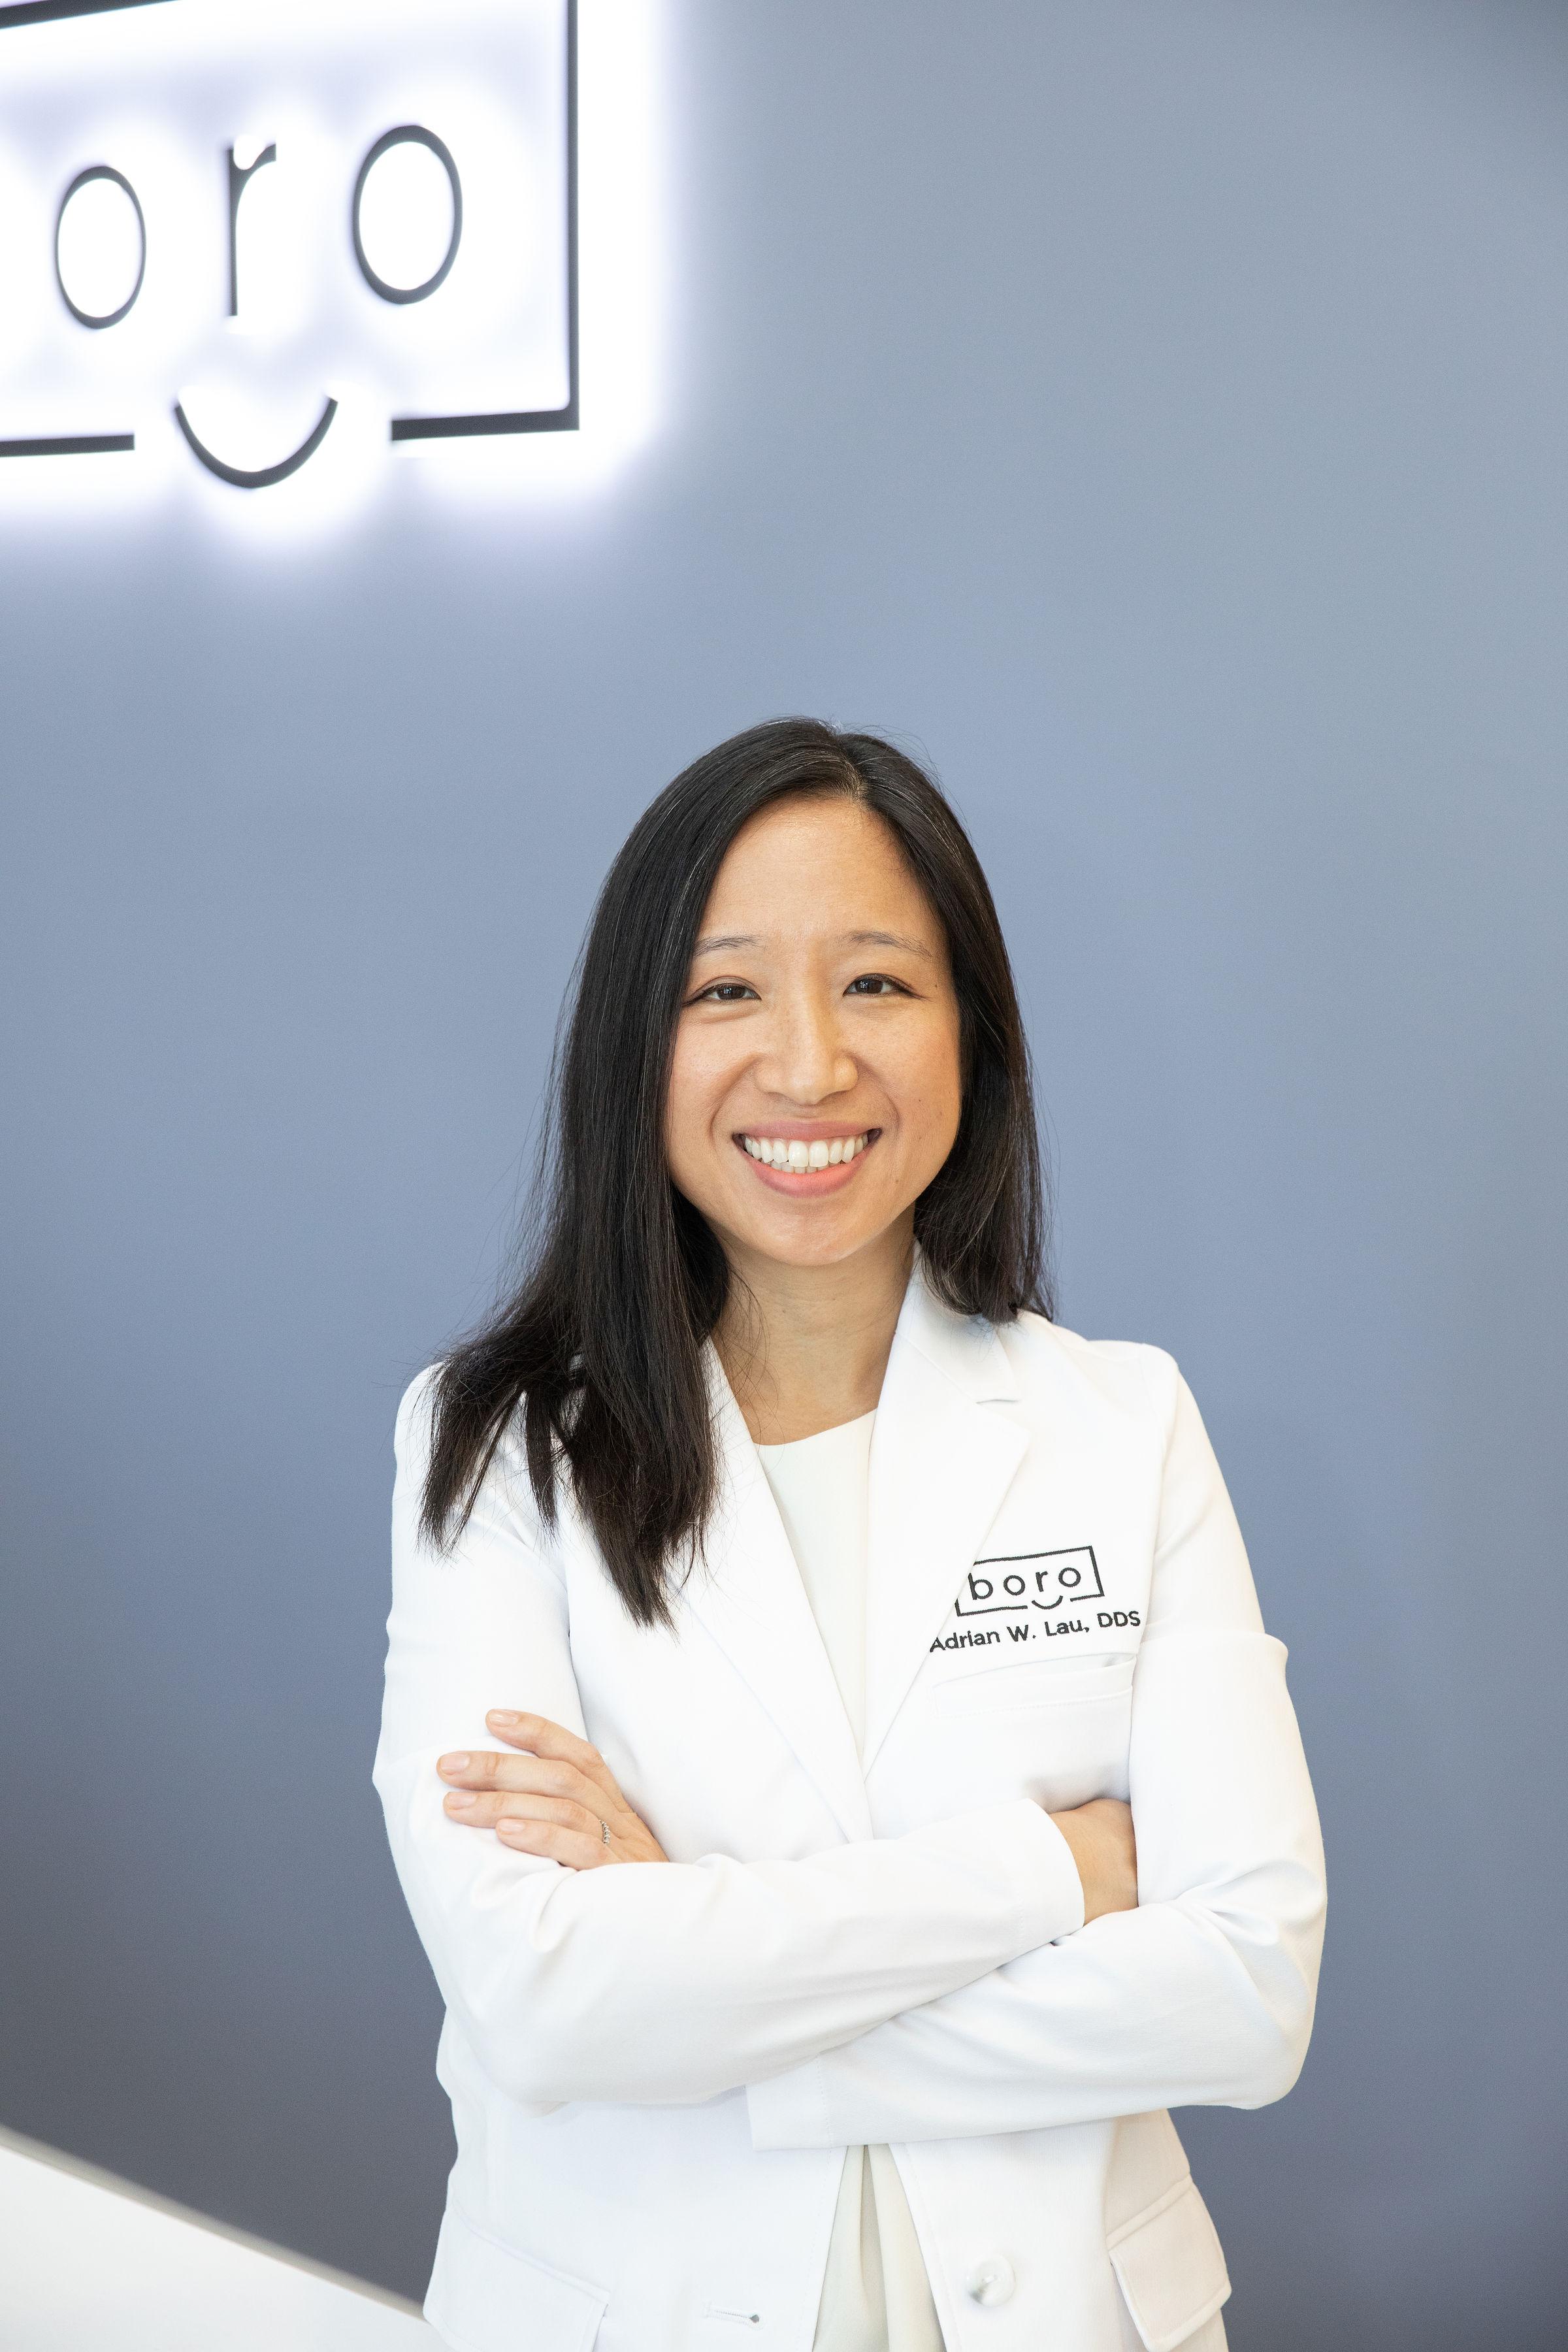 headshot of dr. lau